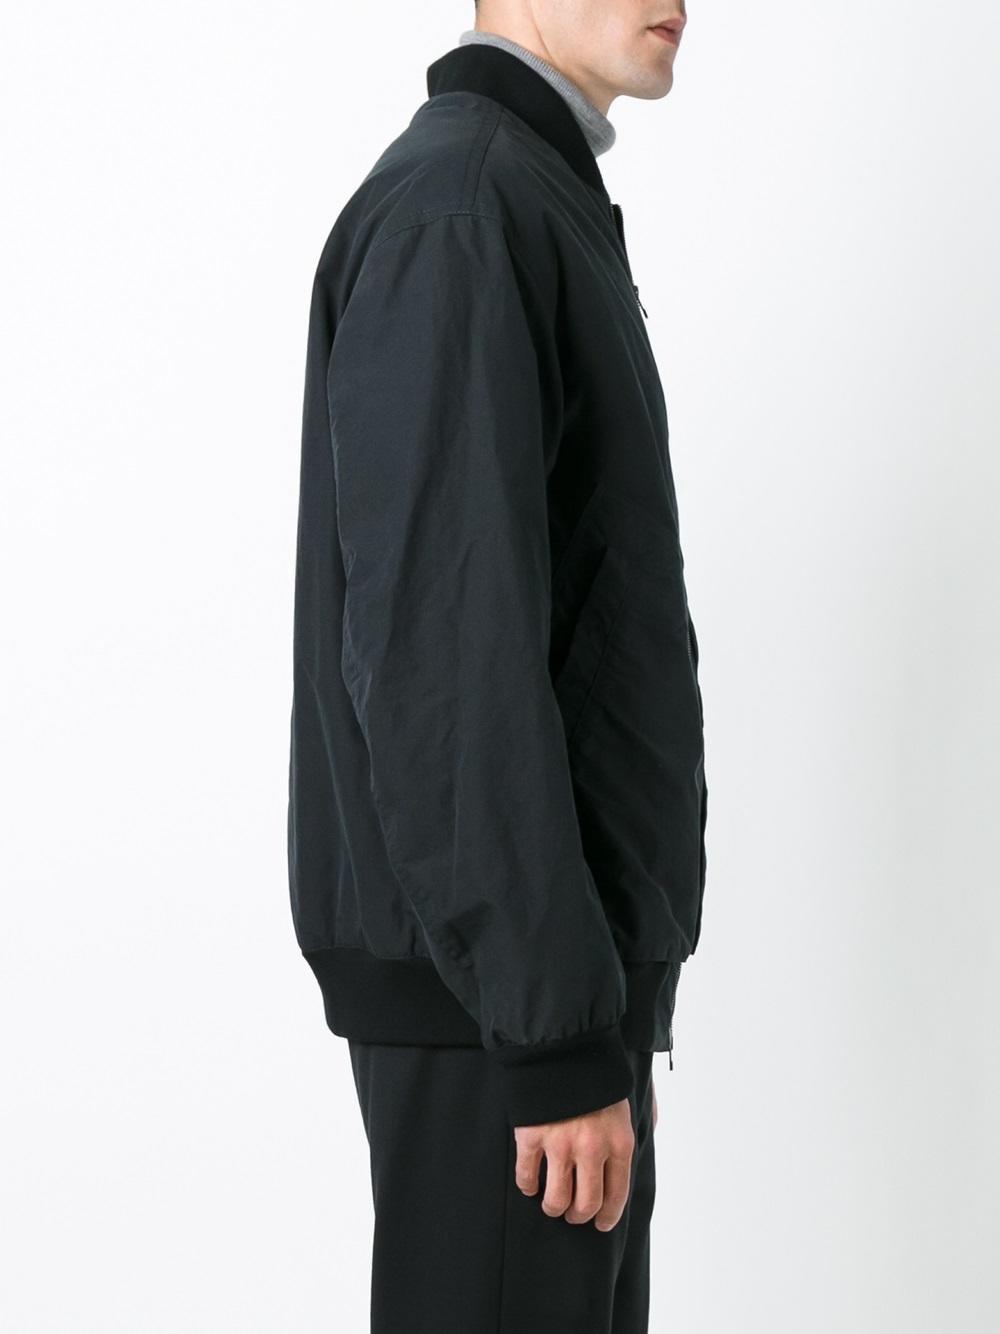 Helmut Lang Wool Classic Bomber Jacket in Black for Men